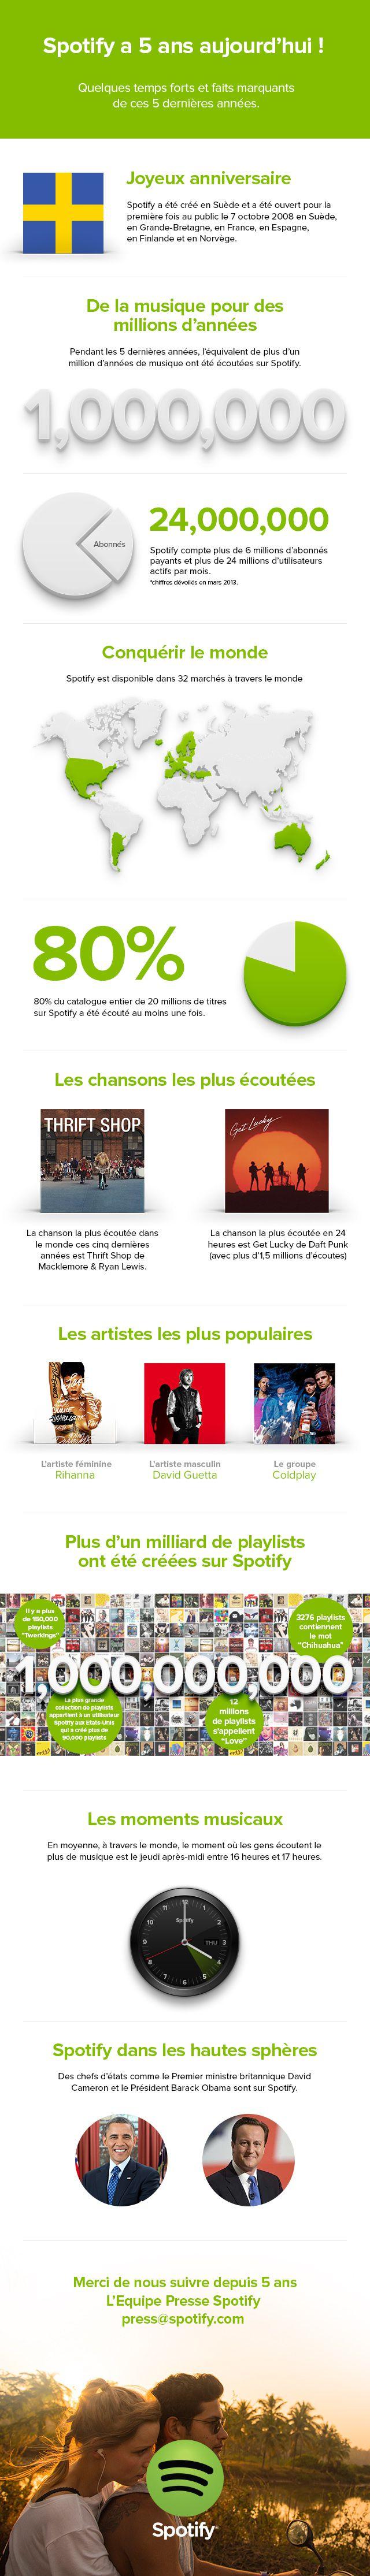 Infographie-presse-5-ans-Spotify